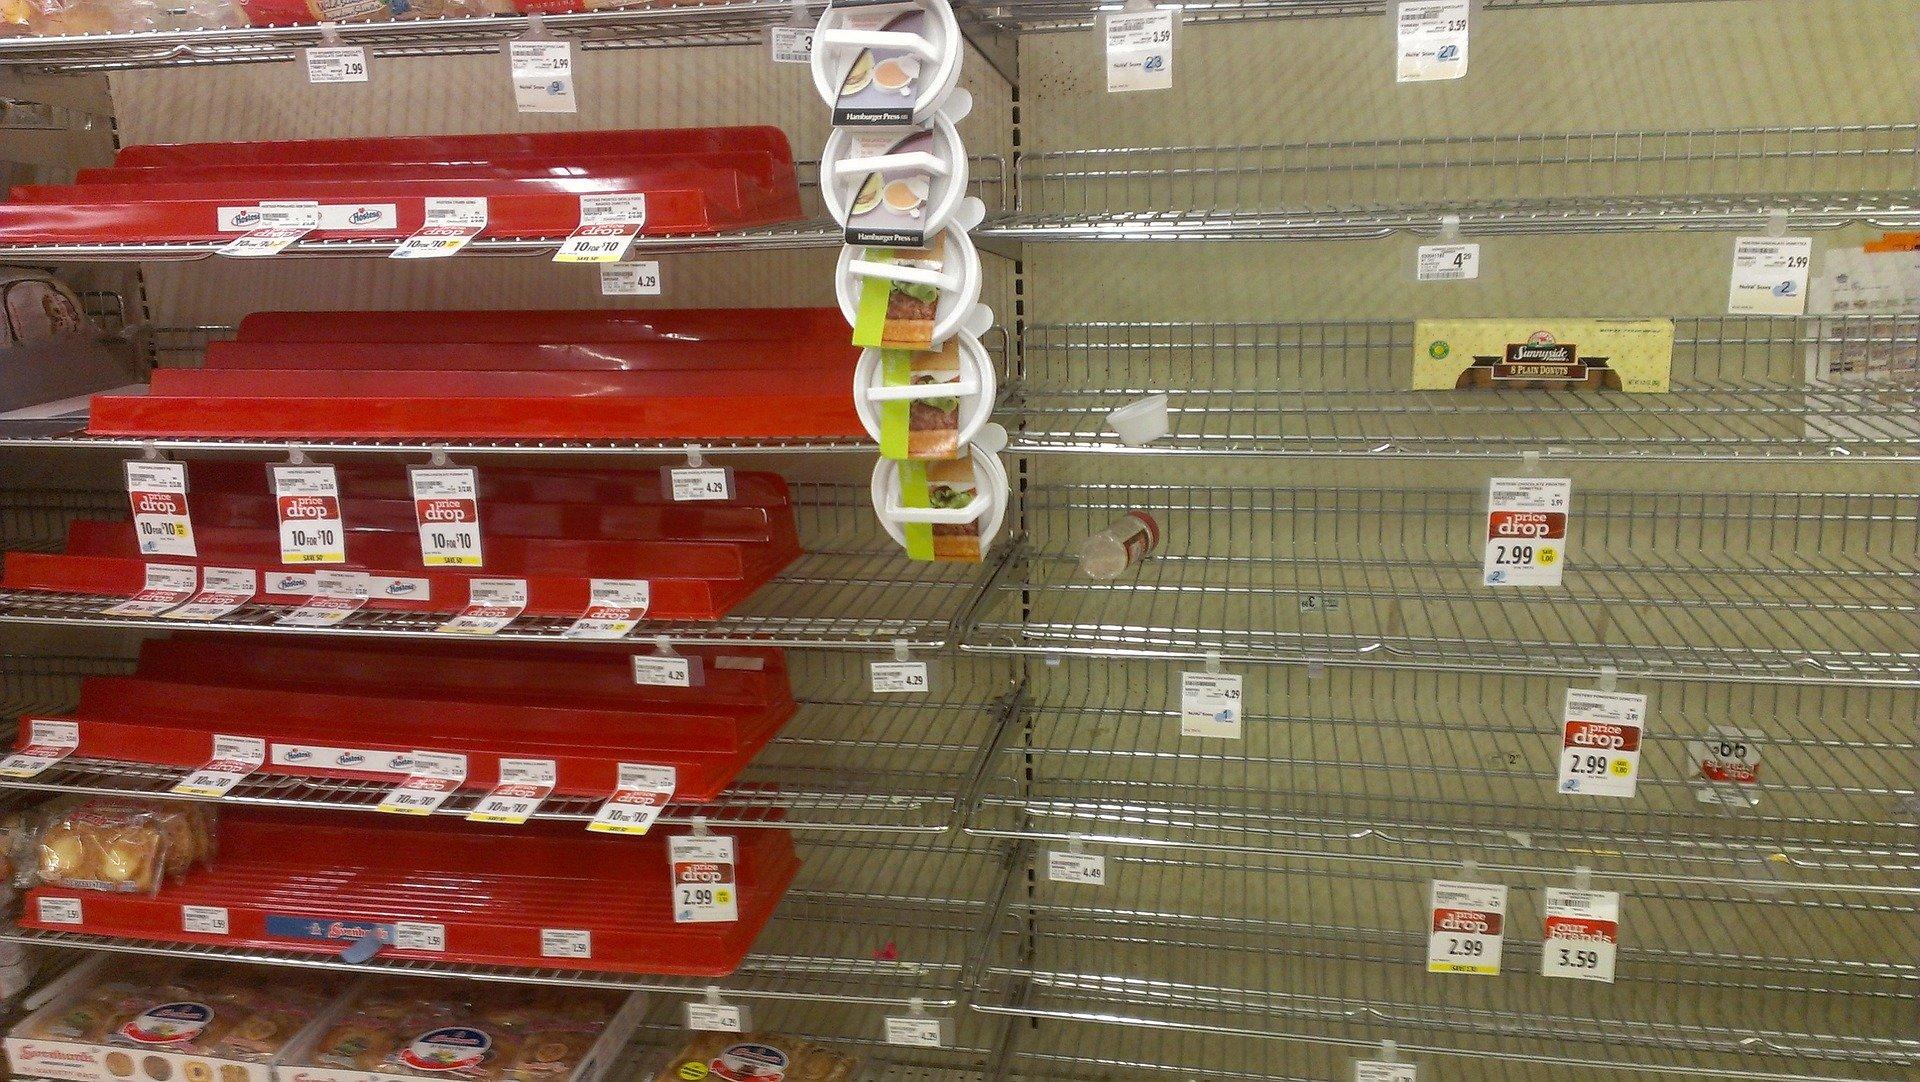 Empty Shelves: Organising Your Corner of an American Apocalypse